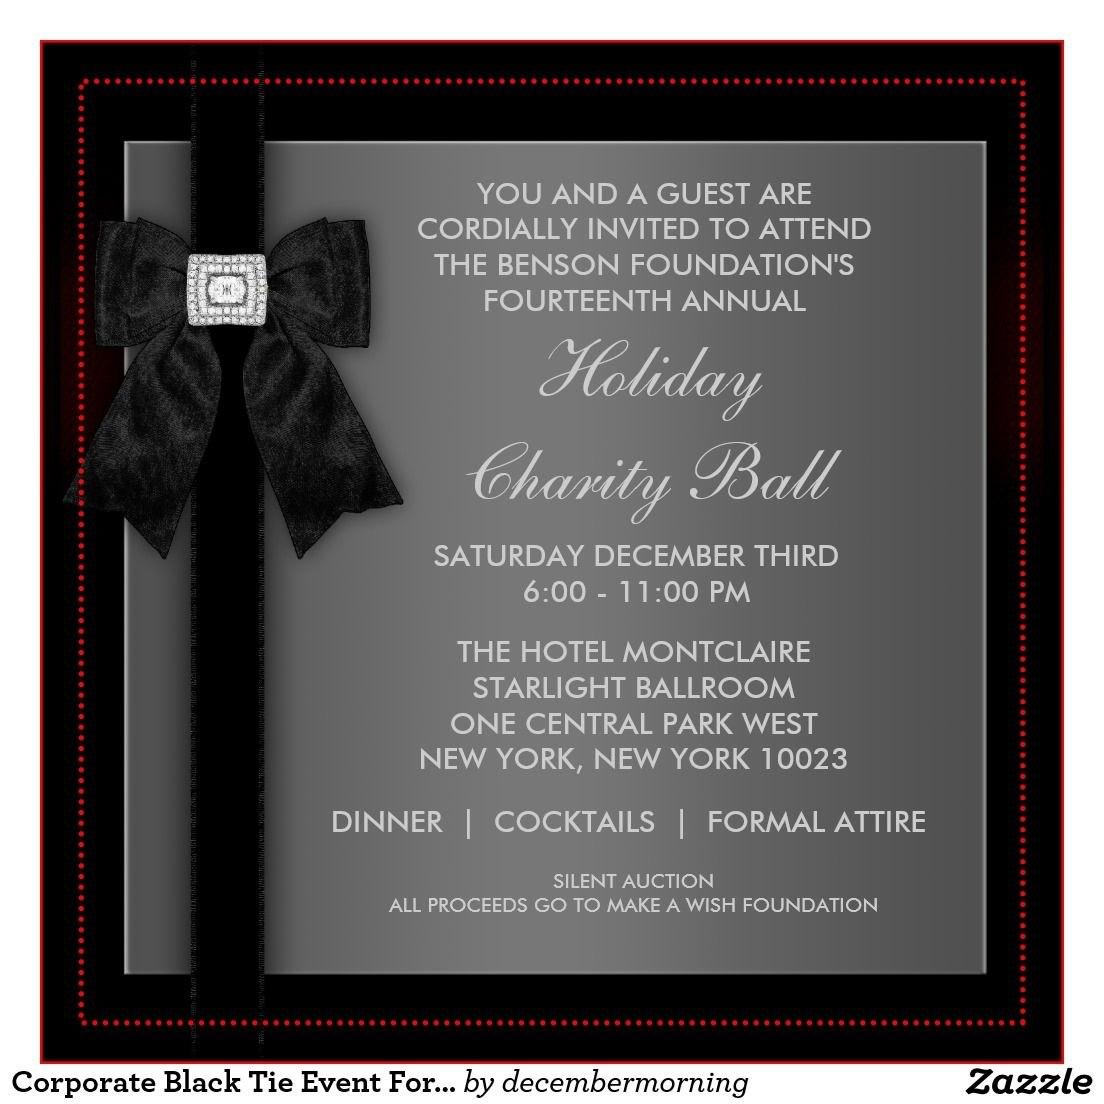 Formal Event Invitation Card Sample  Google Search  Invitations In In Event Invitation Card Template